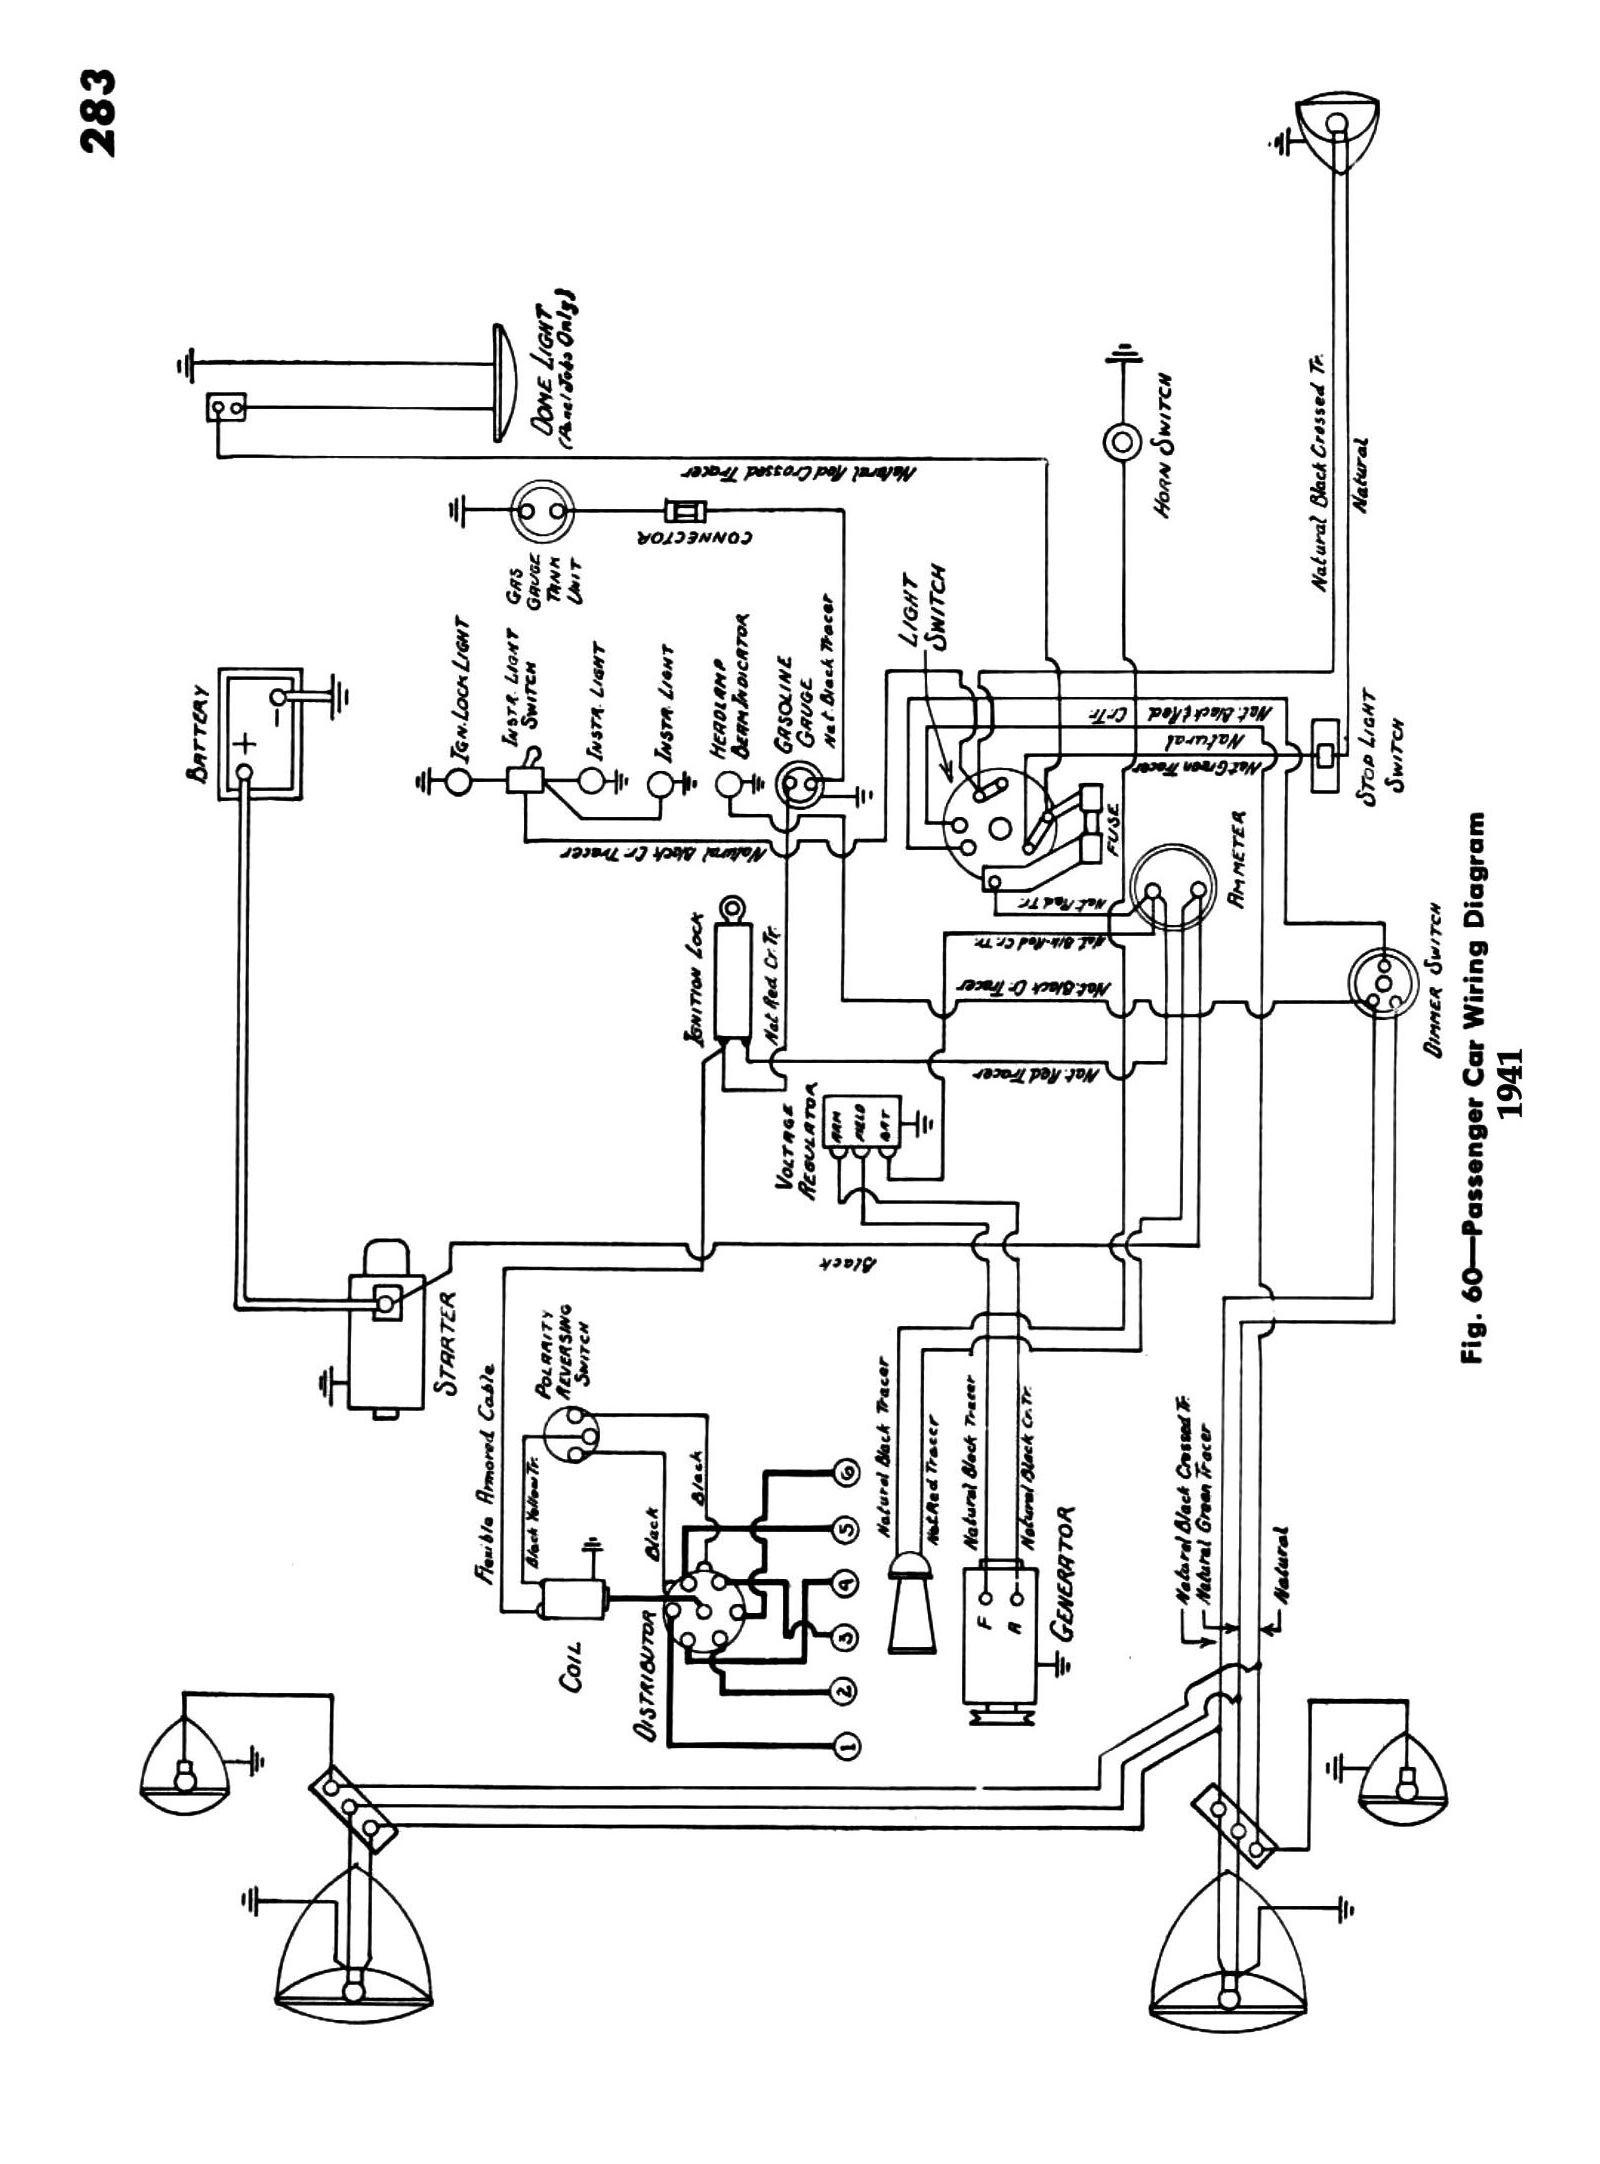 1984 Chevy Truck Wiring Diagram Chevy Wiring Diagrams Of 1984 Chevy Truck Wiring Diagram